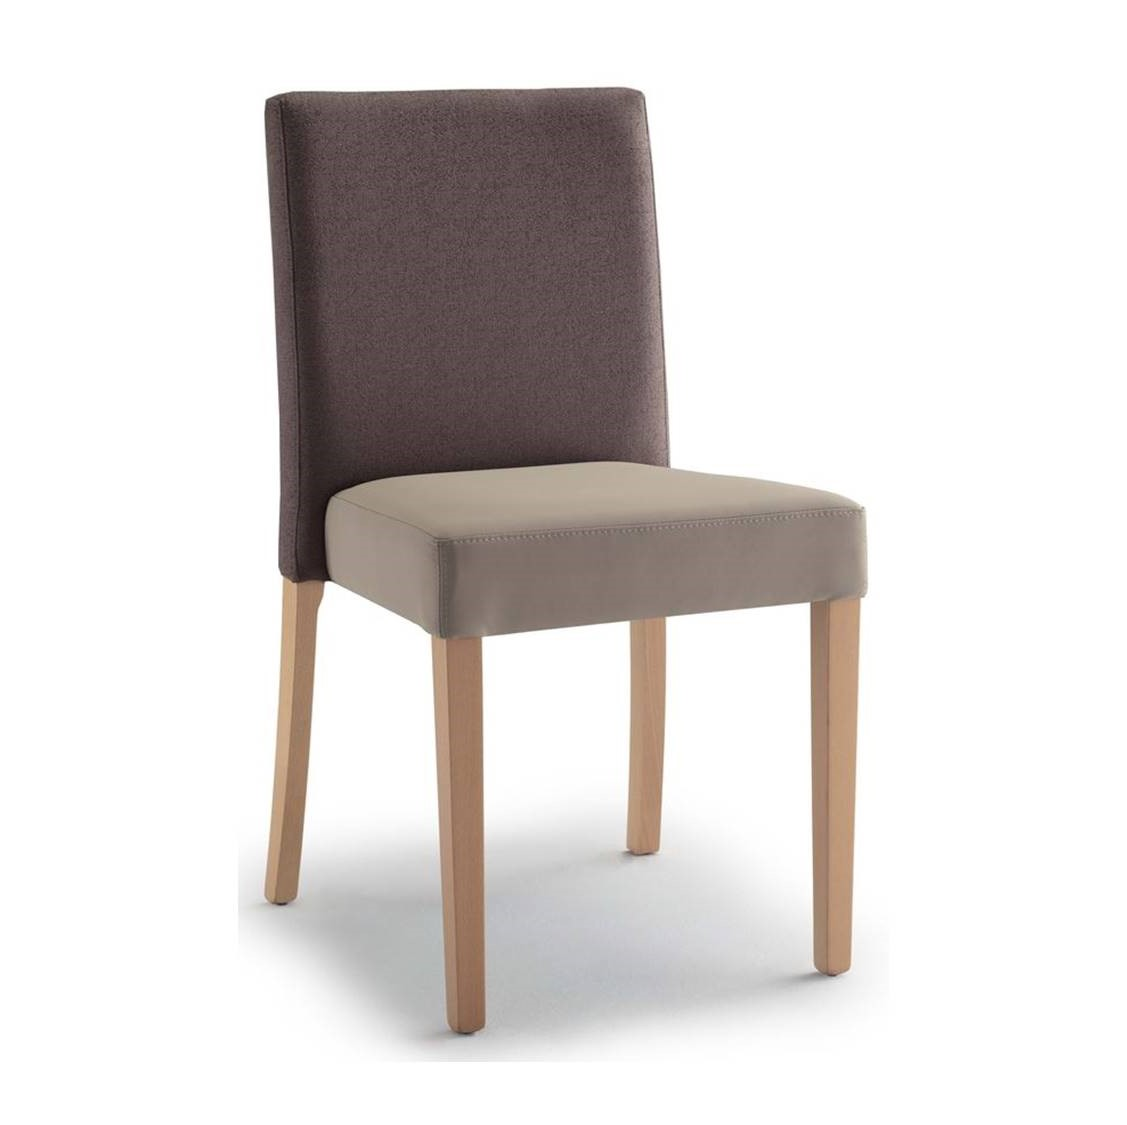 Aubrey stackbale side chair DeFrae Contract Furniture